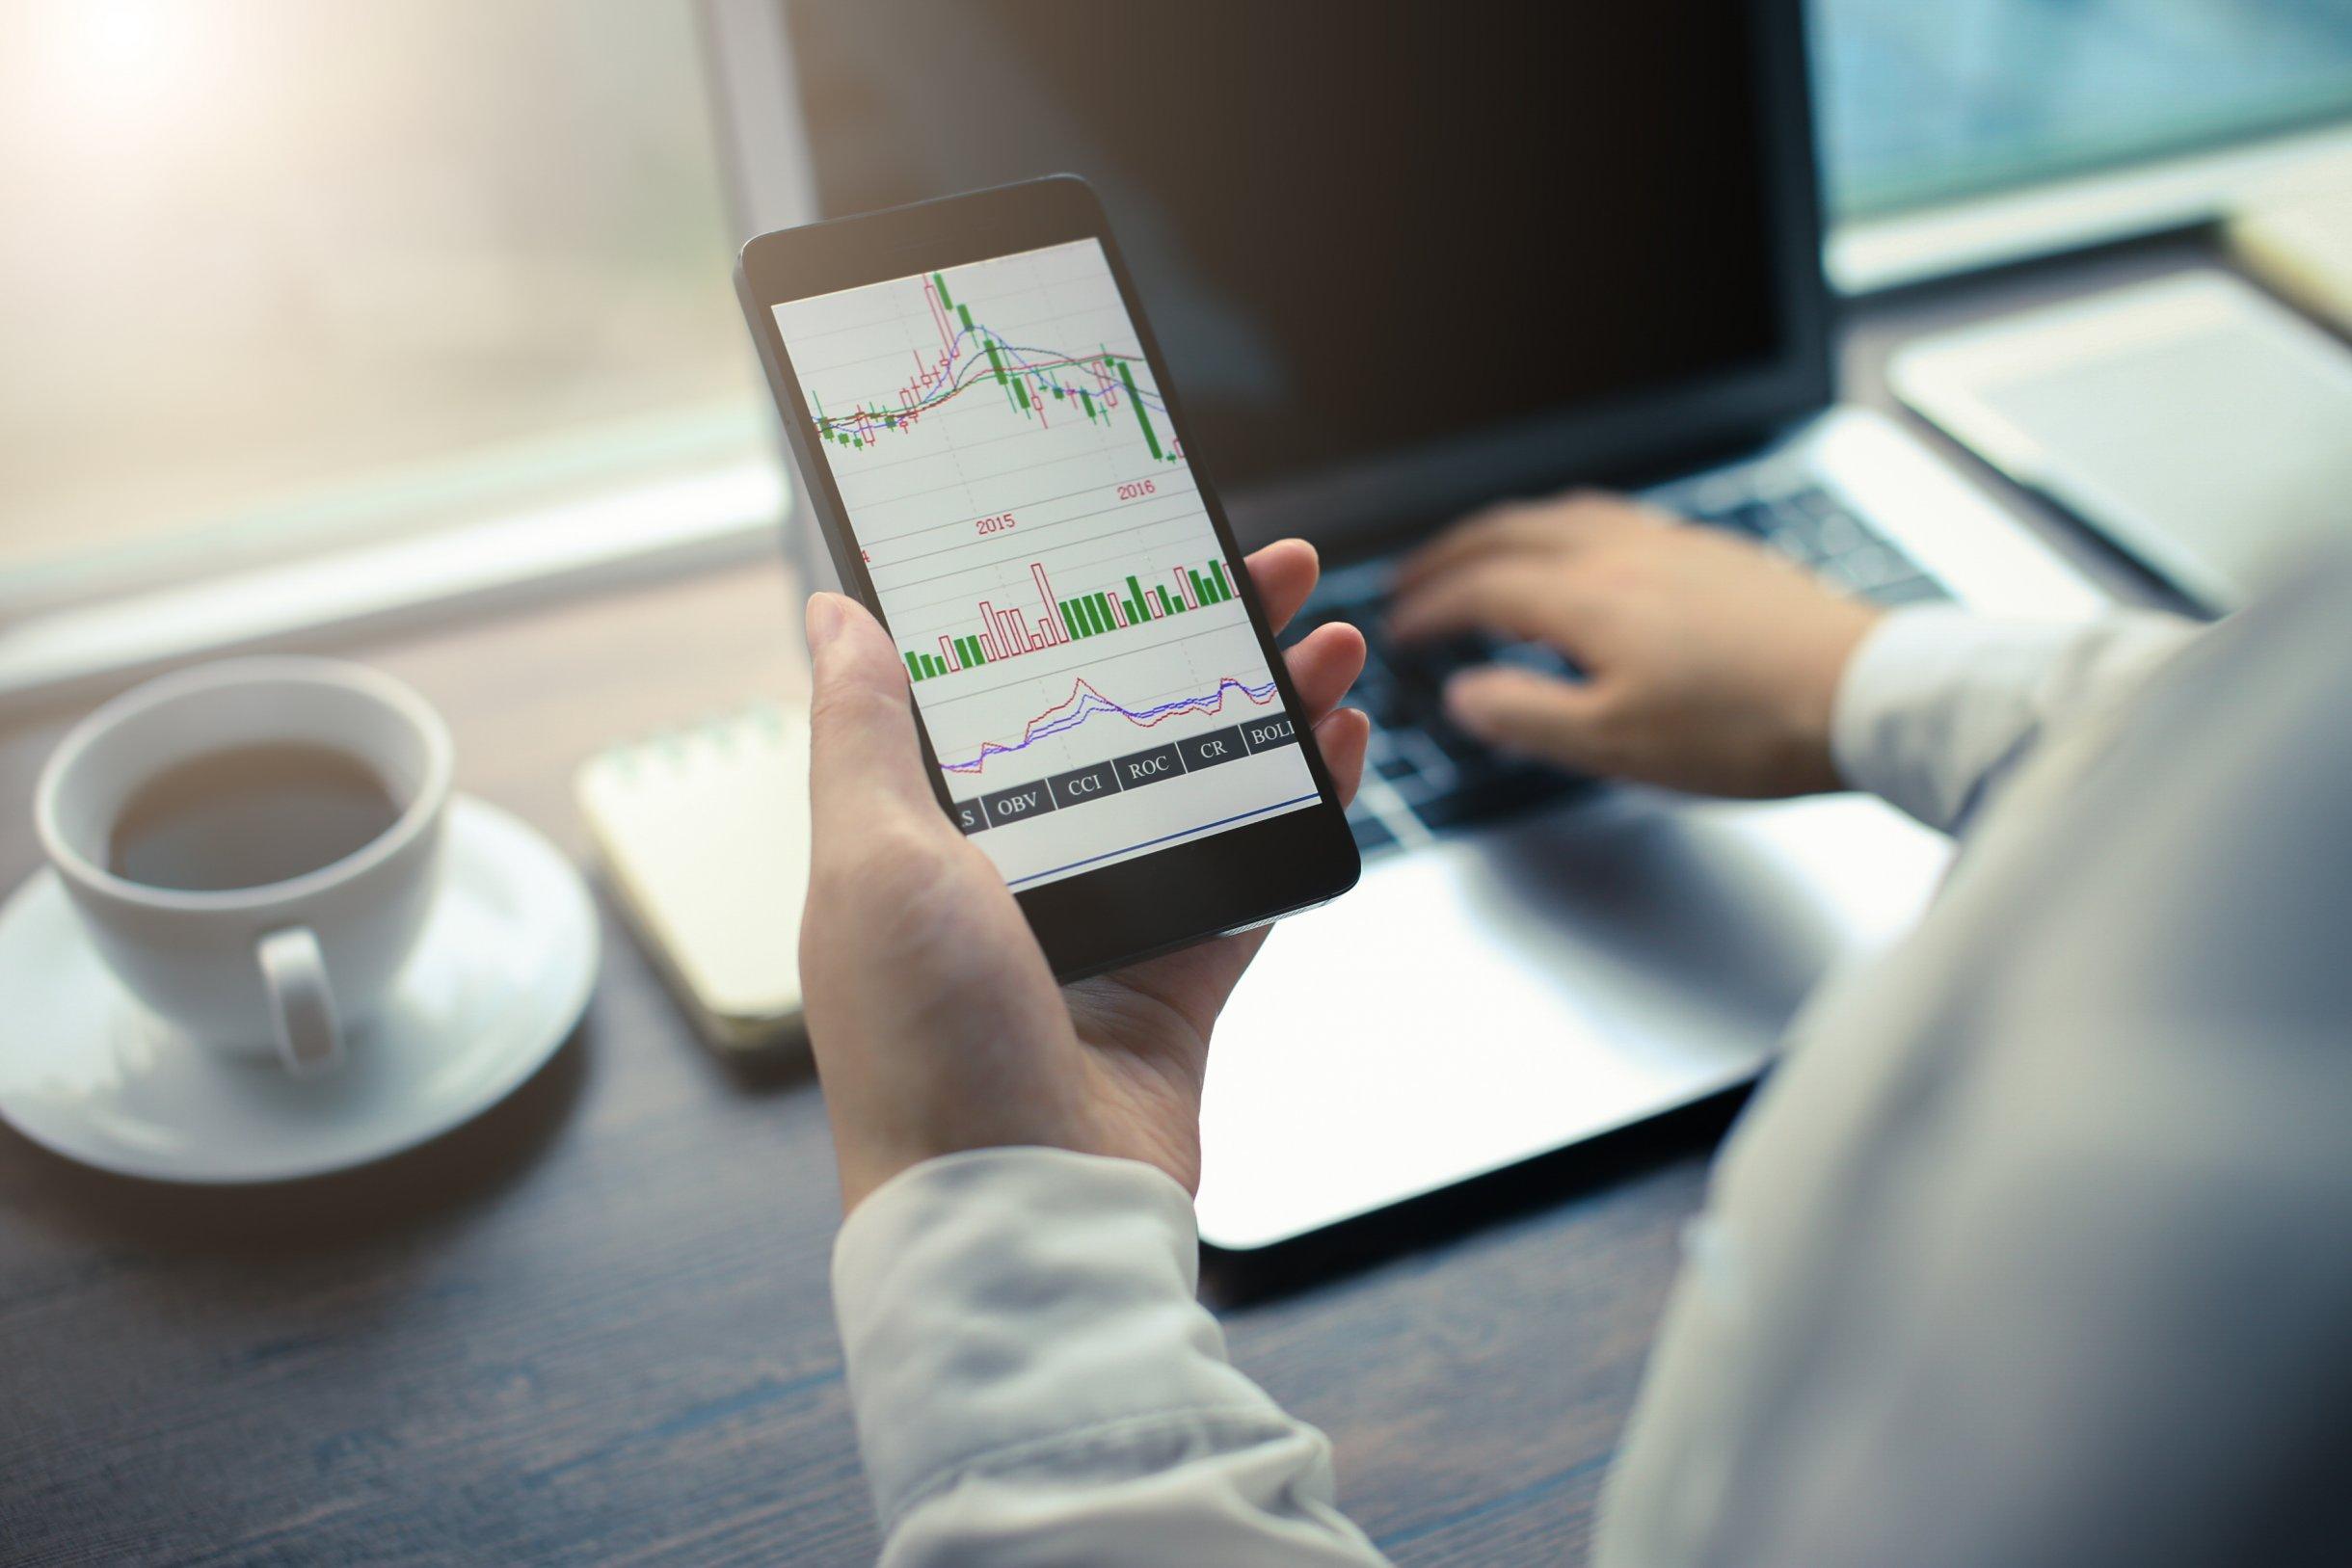 BBVA: Traditional retail bank embraces digital disruption